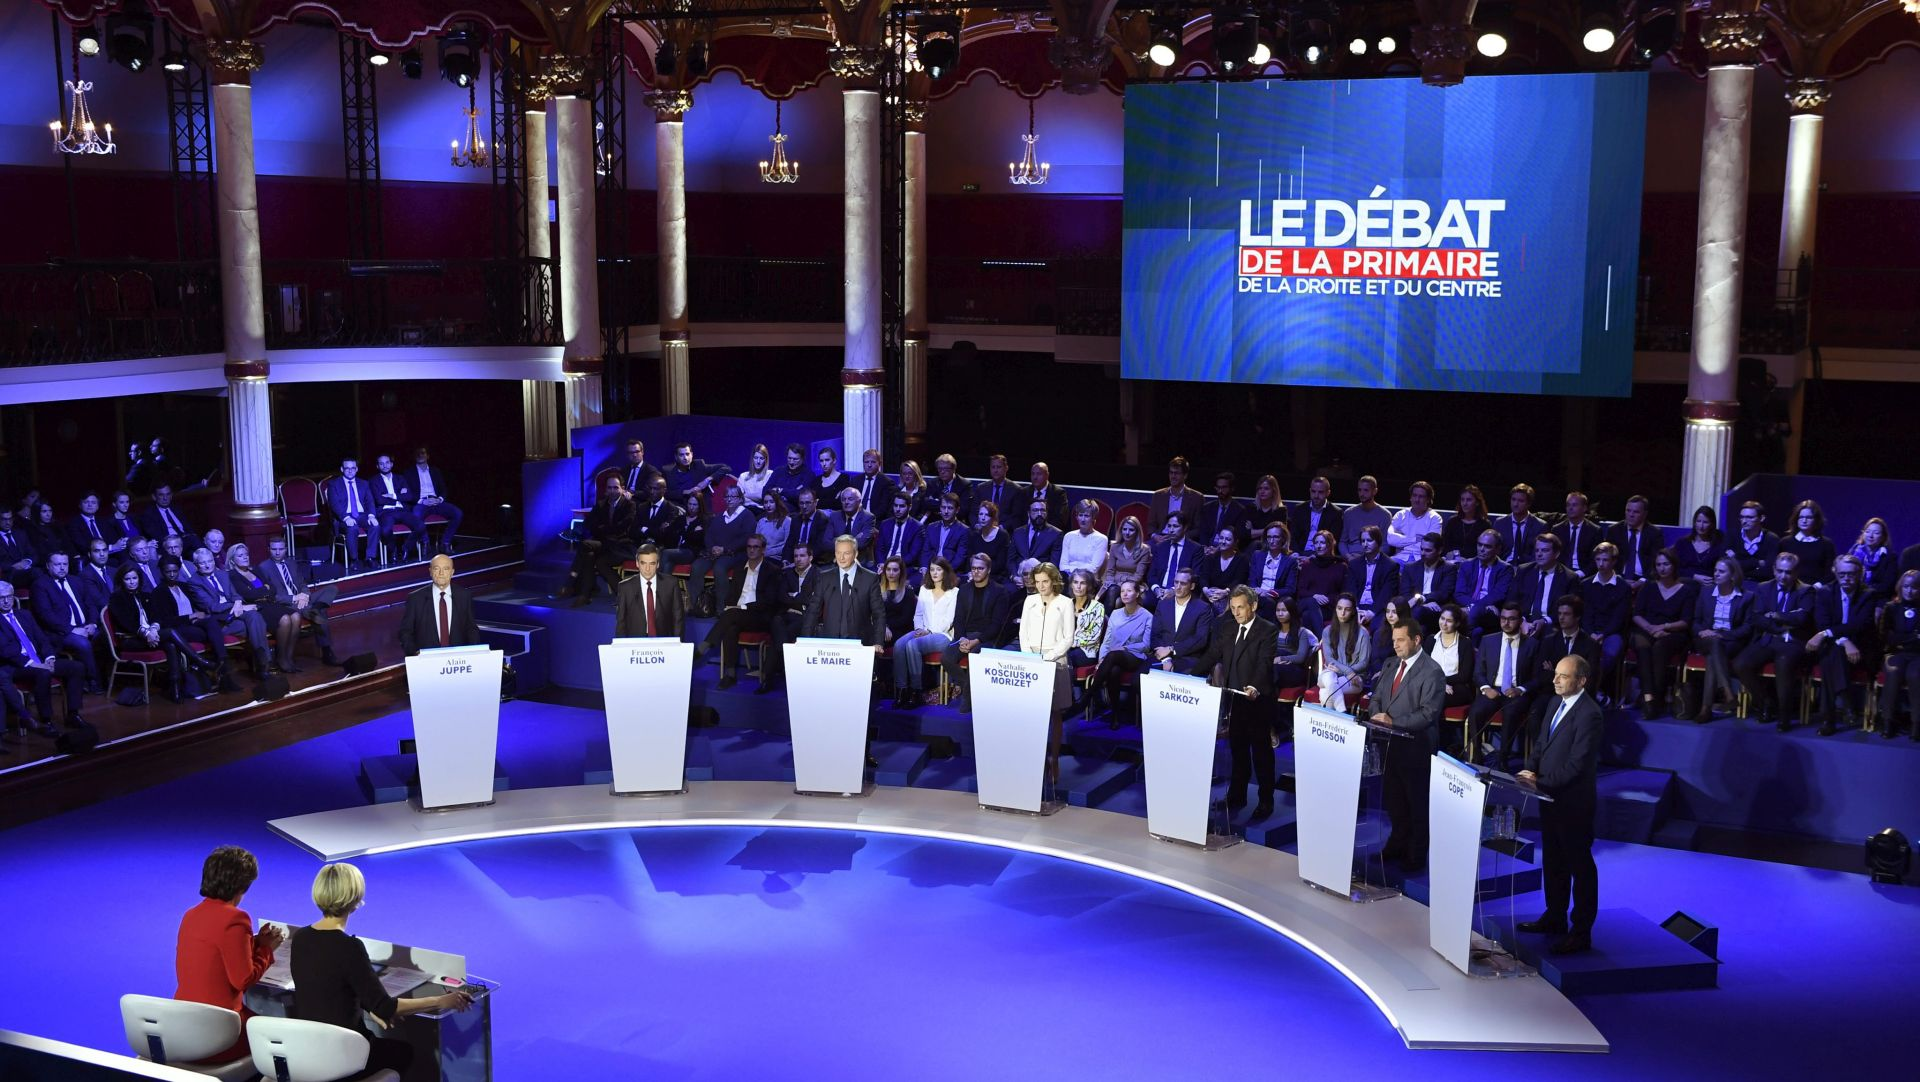 Predizbori na francuskoj desnici: U prvom krugu trojica favorita